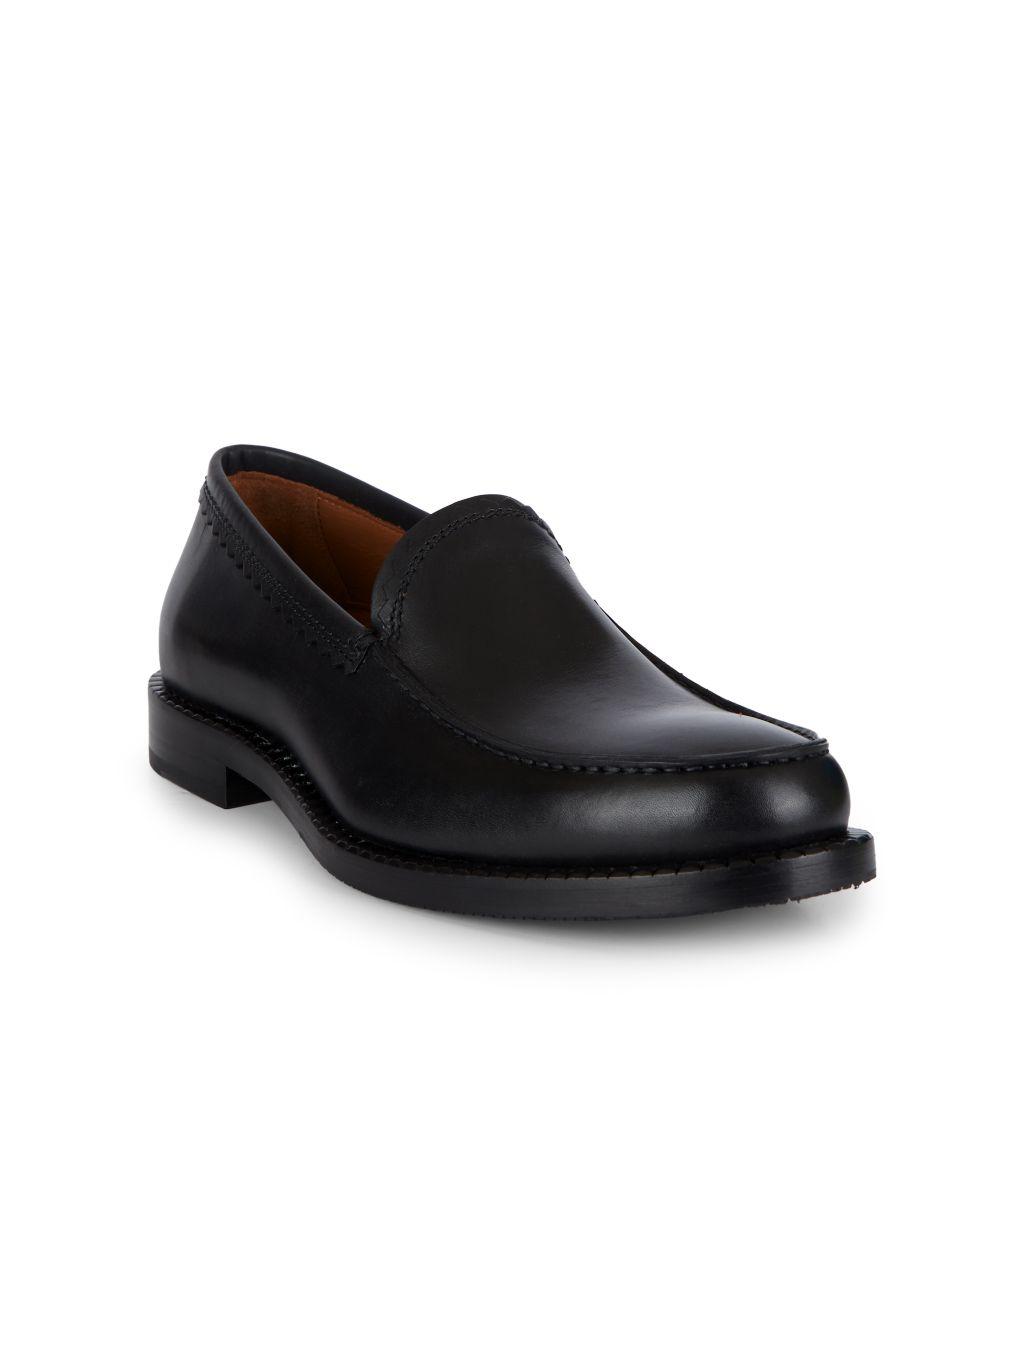 Aquatalia Jesse Leather Loafers